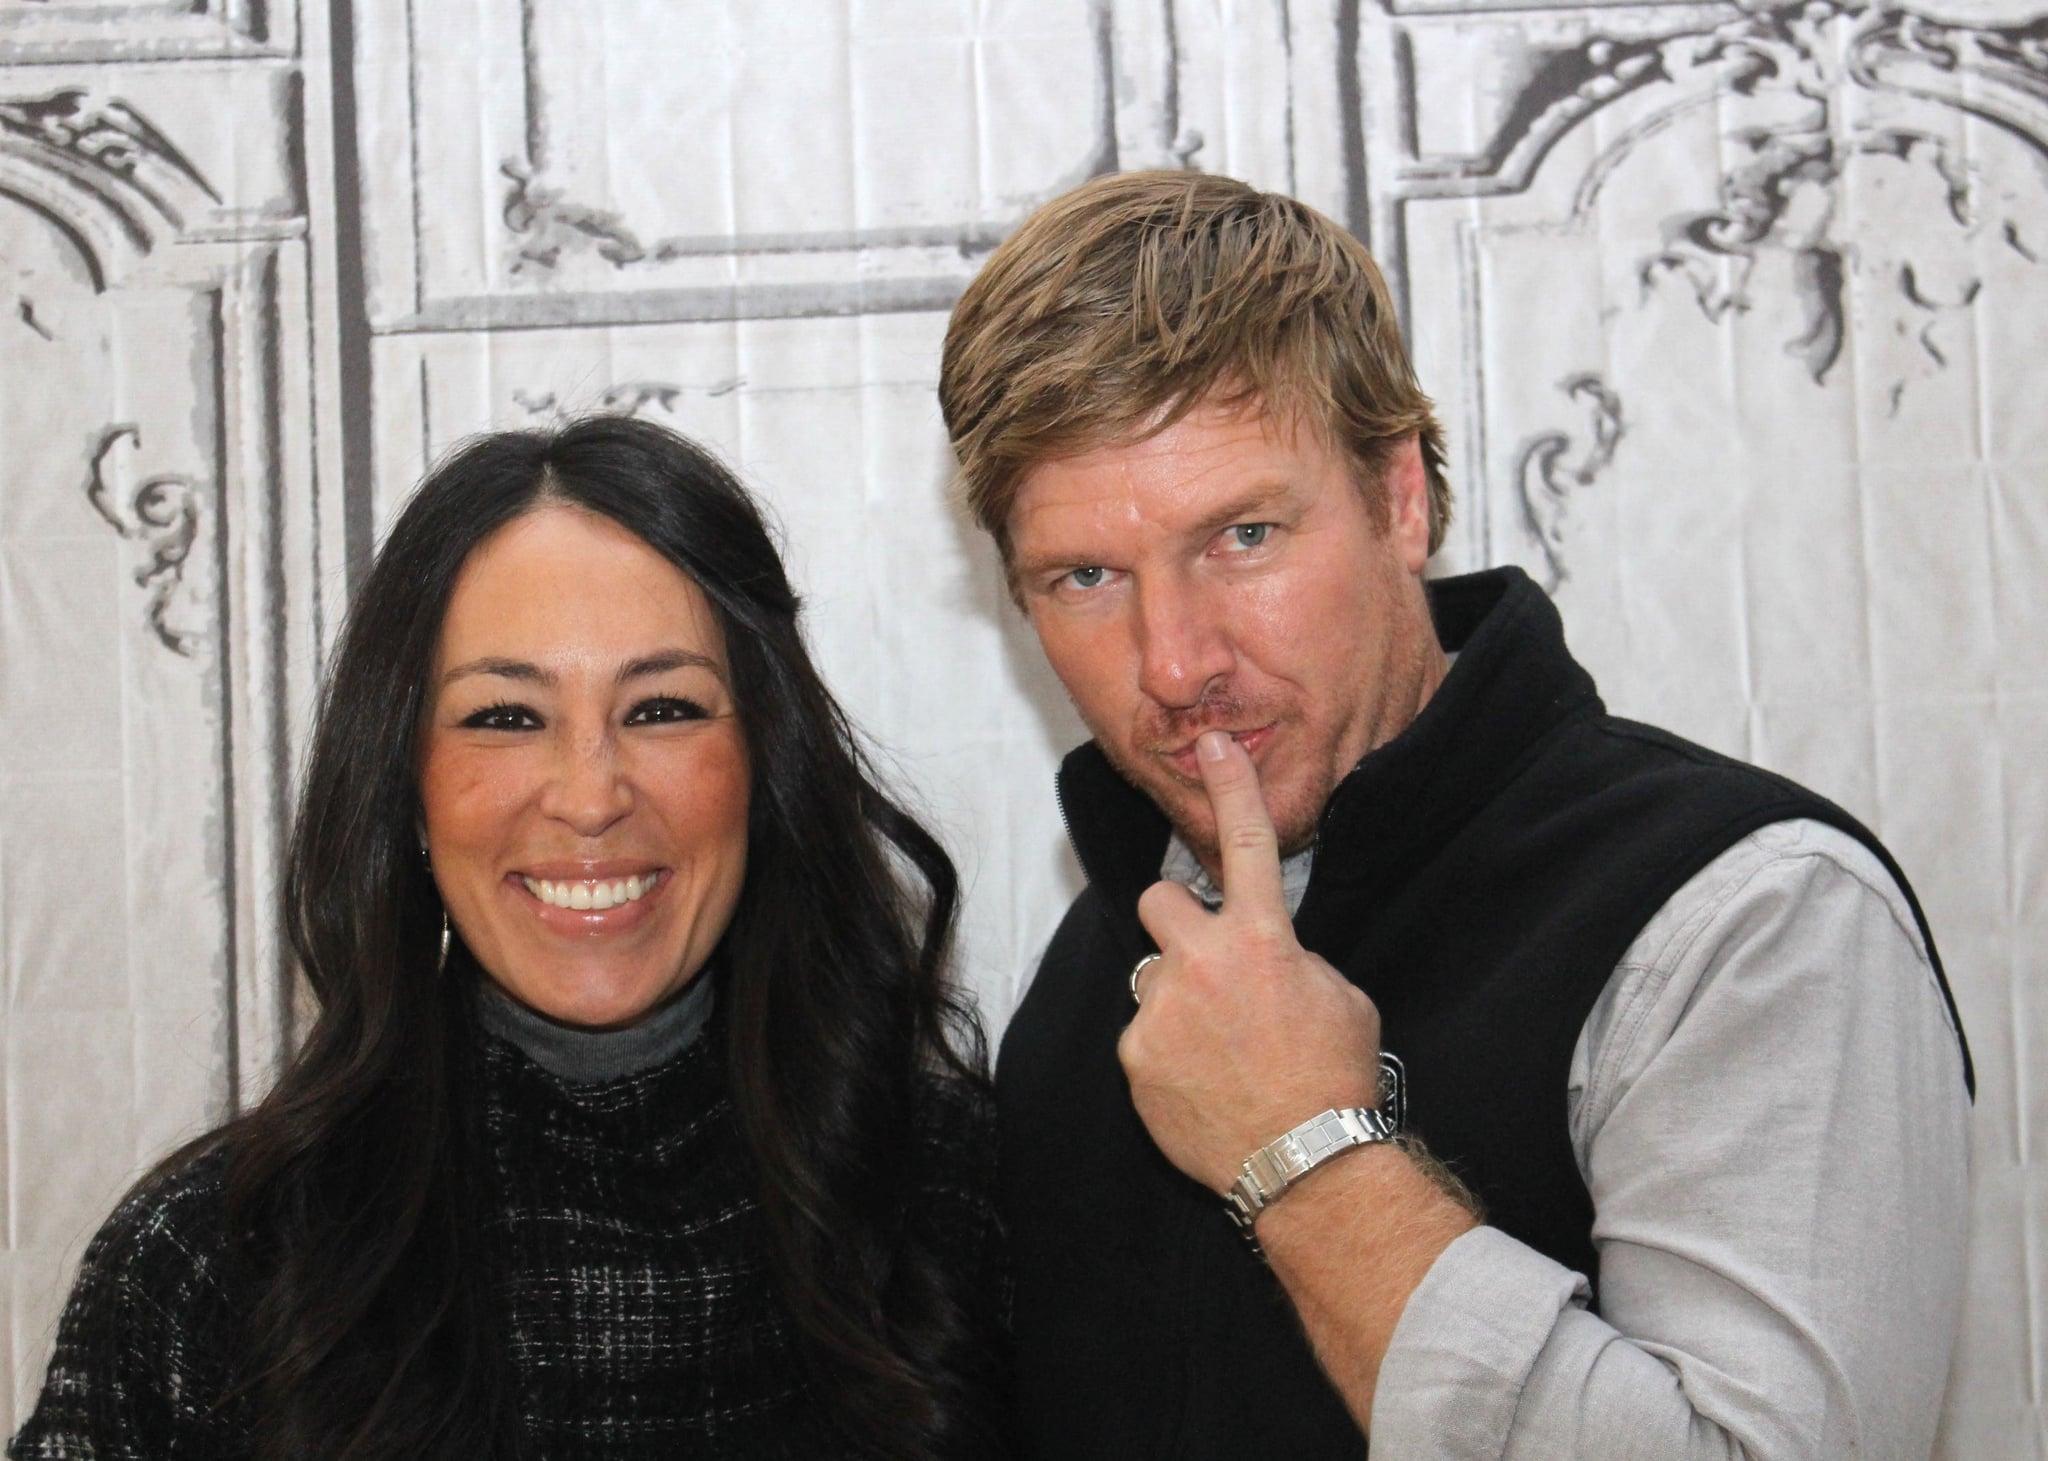 Hgtv 39 S Chip And Joanna Gaines Interview Popsugar Home